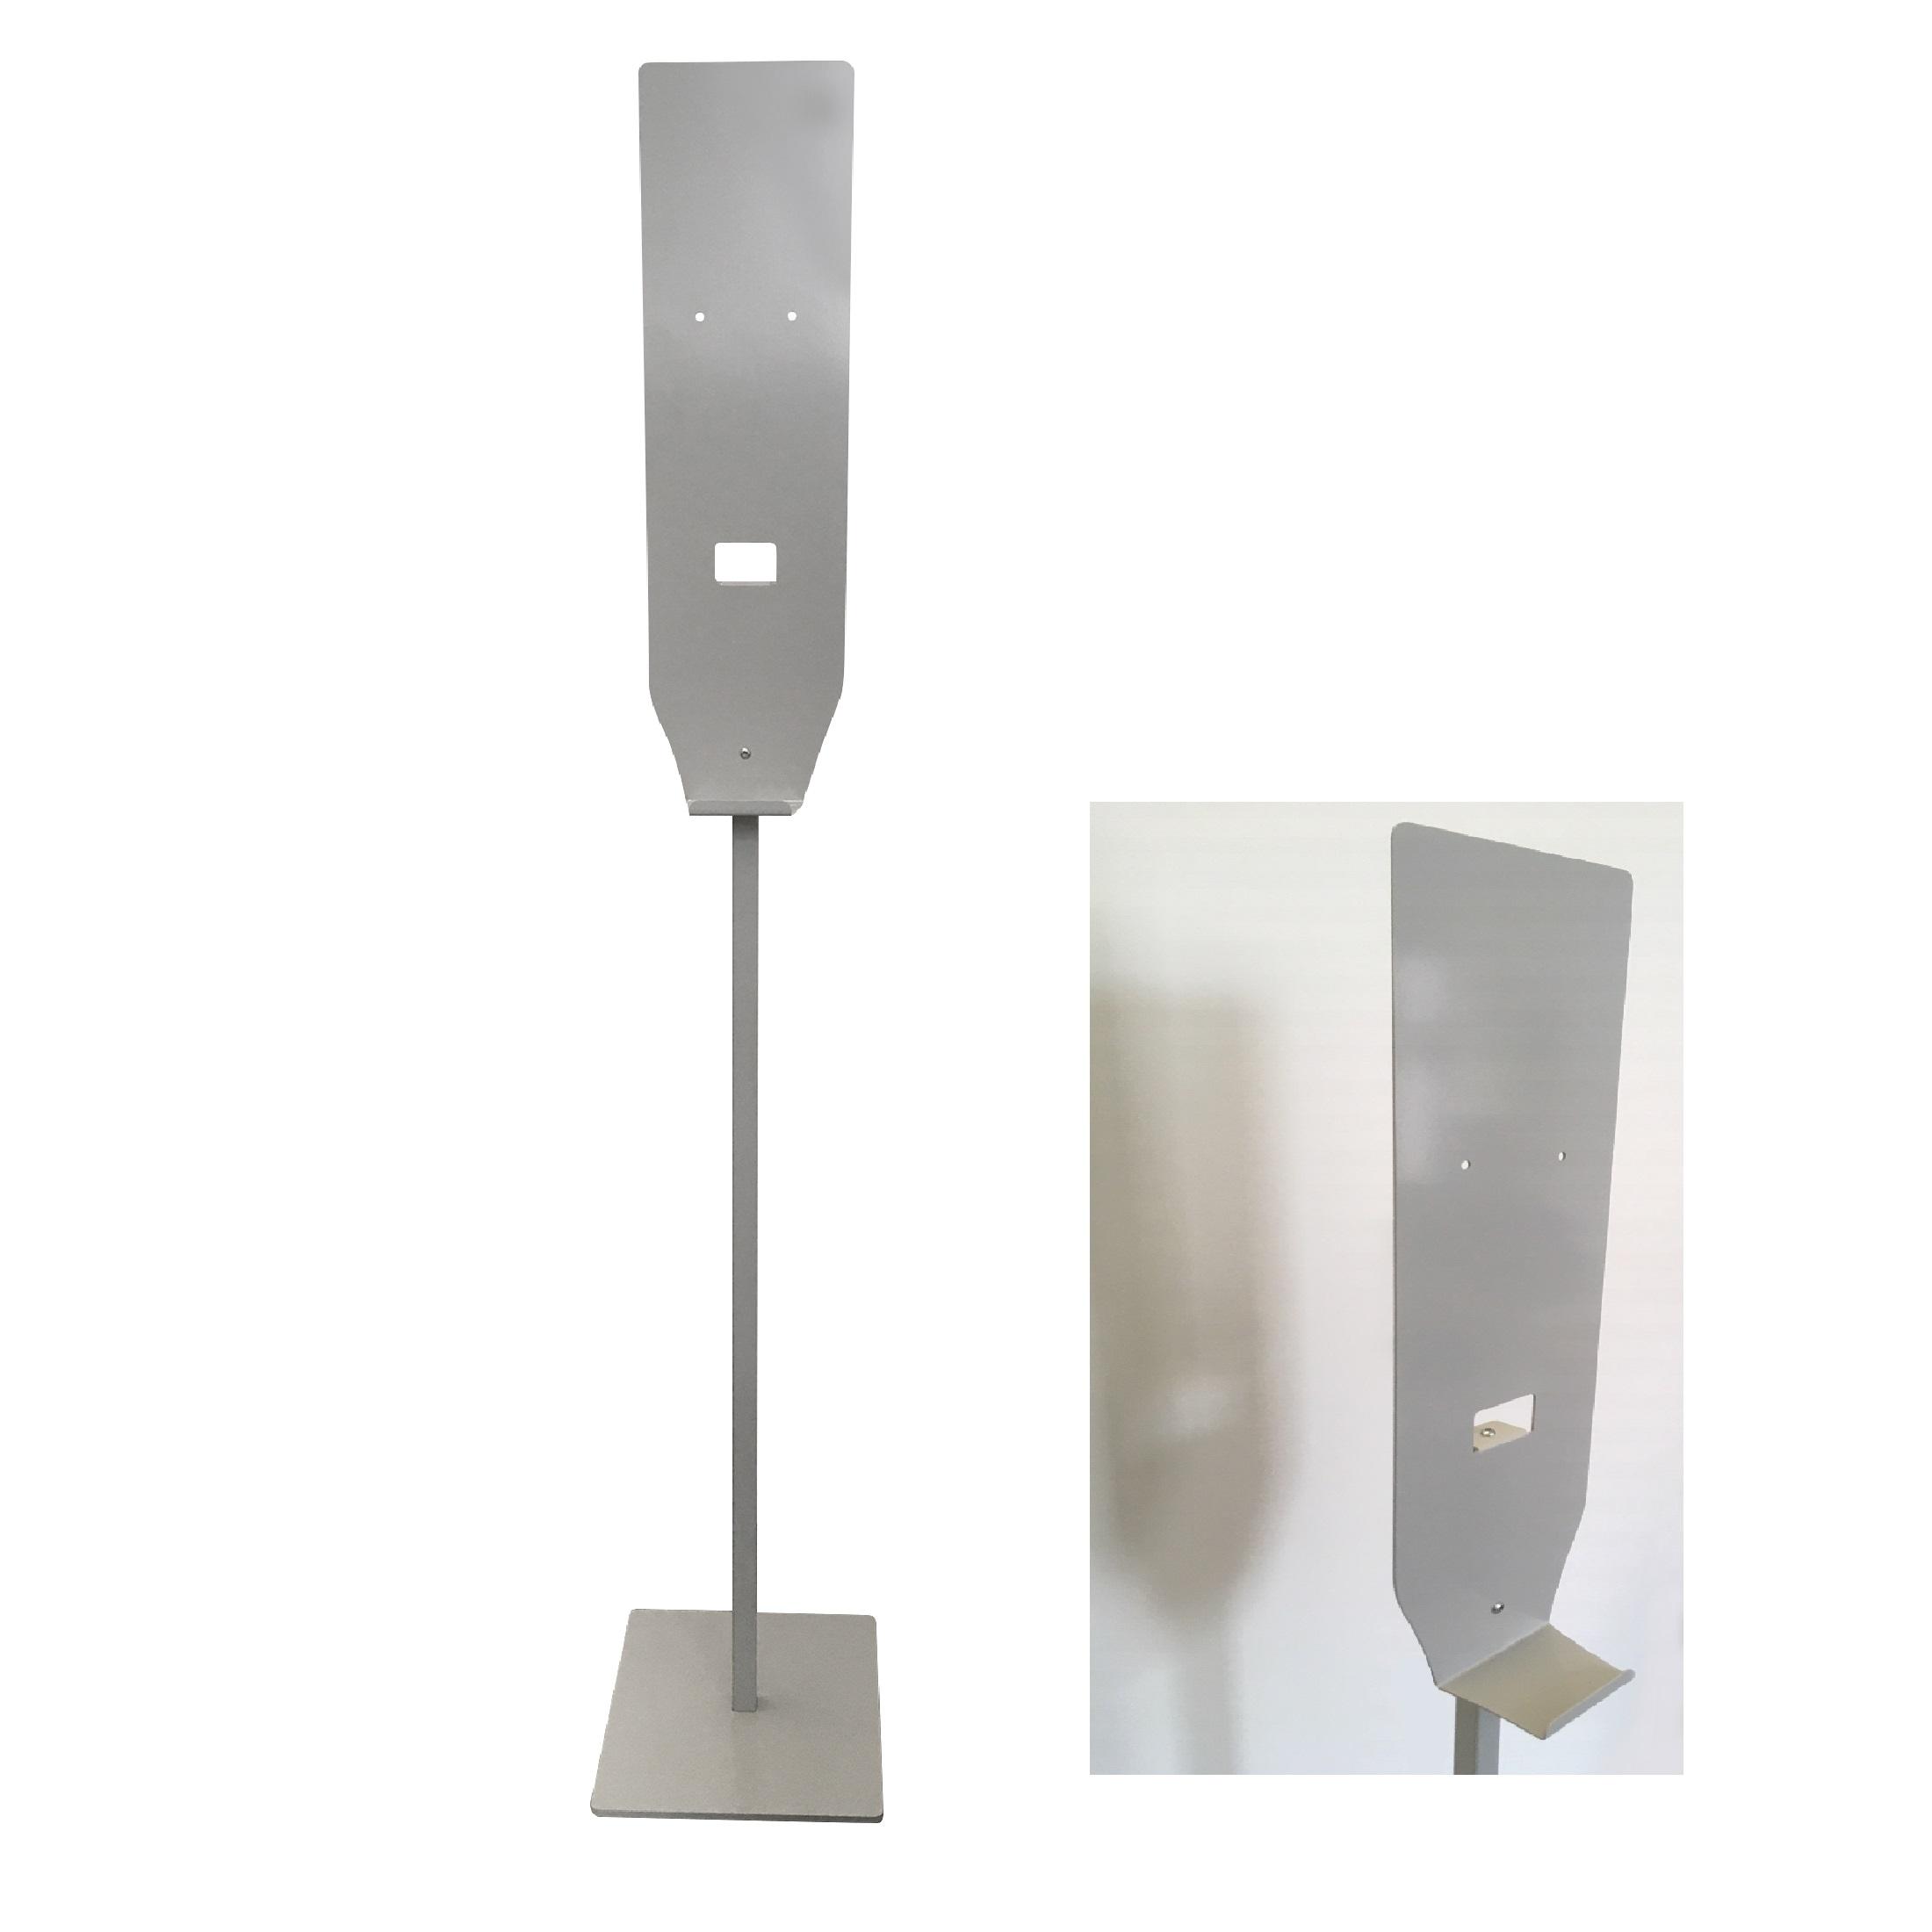 colonna portadosatore gel igienizzante colore argento